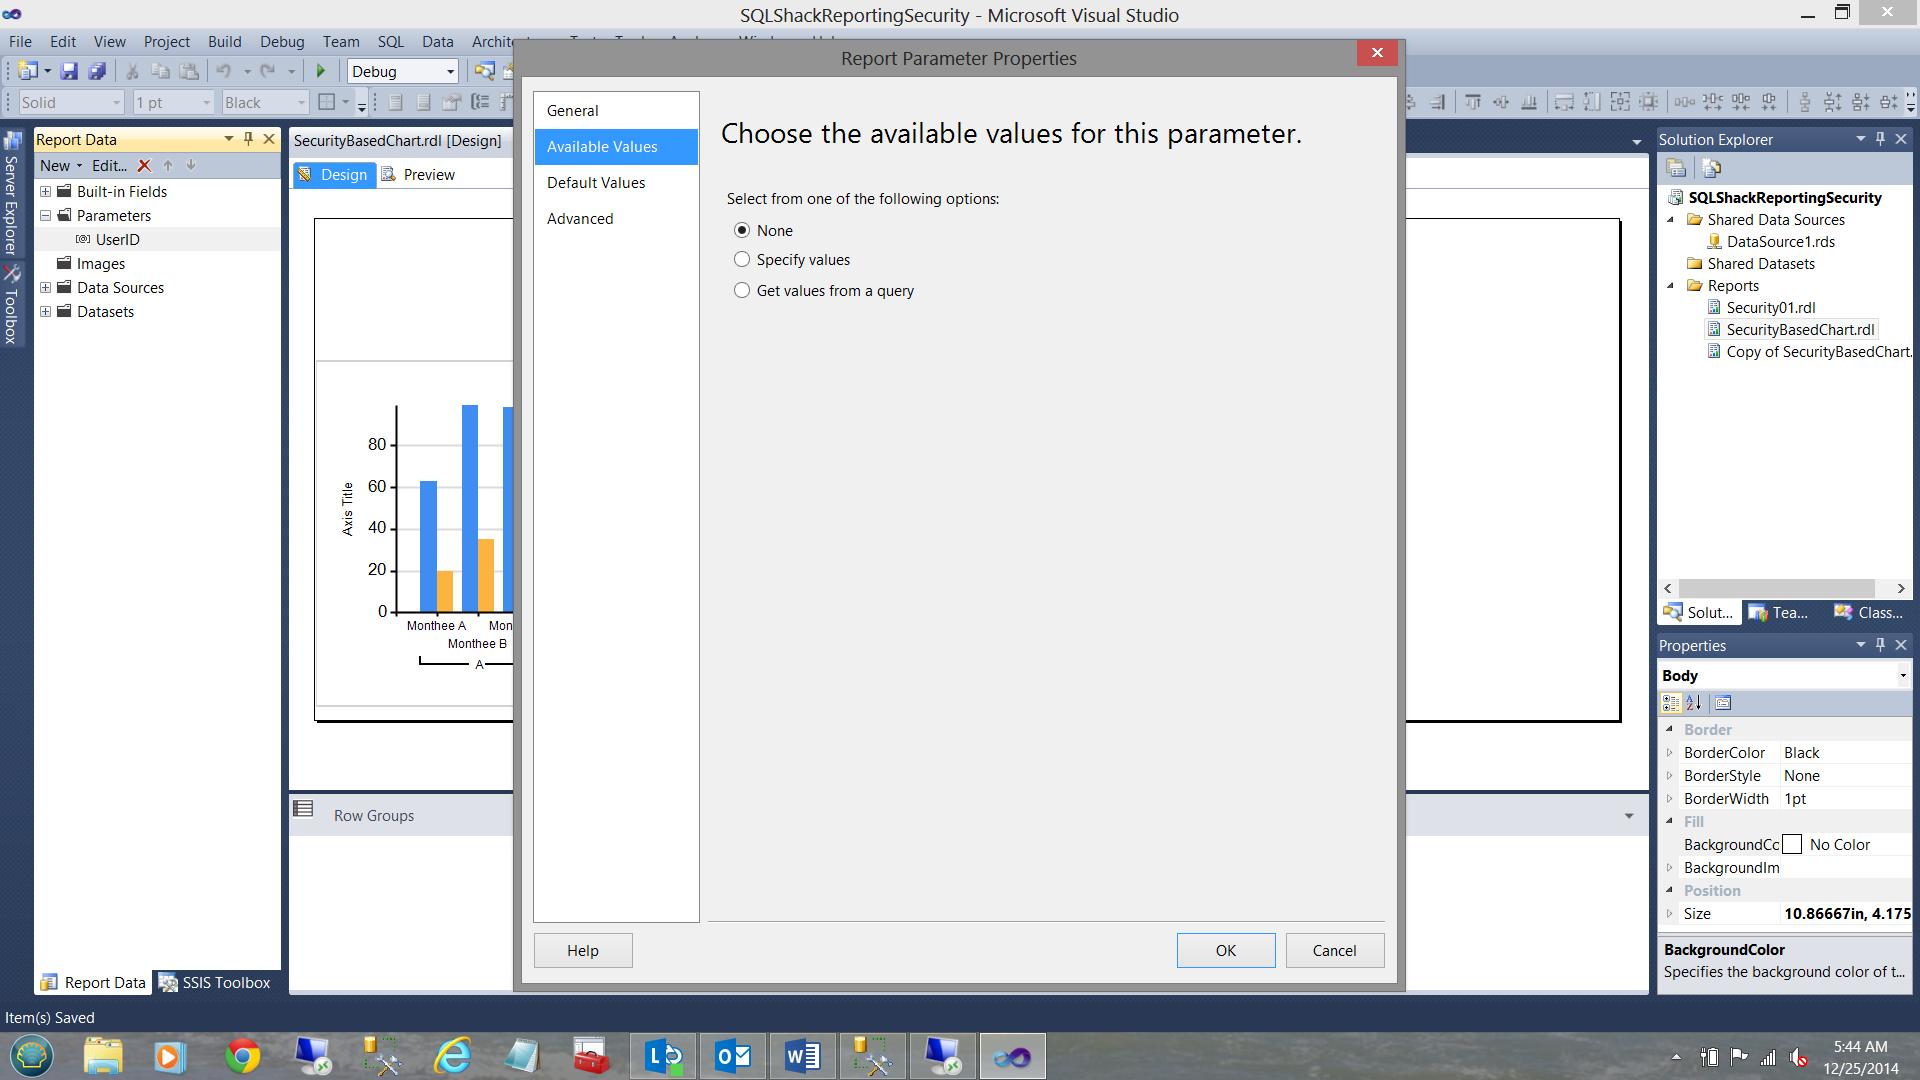 SQL Server安全机制–如何控制用户能够在报告中查看哪些数据28